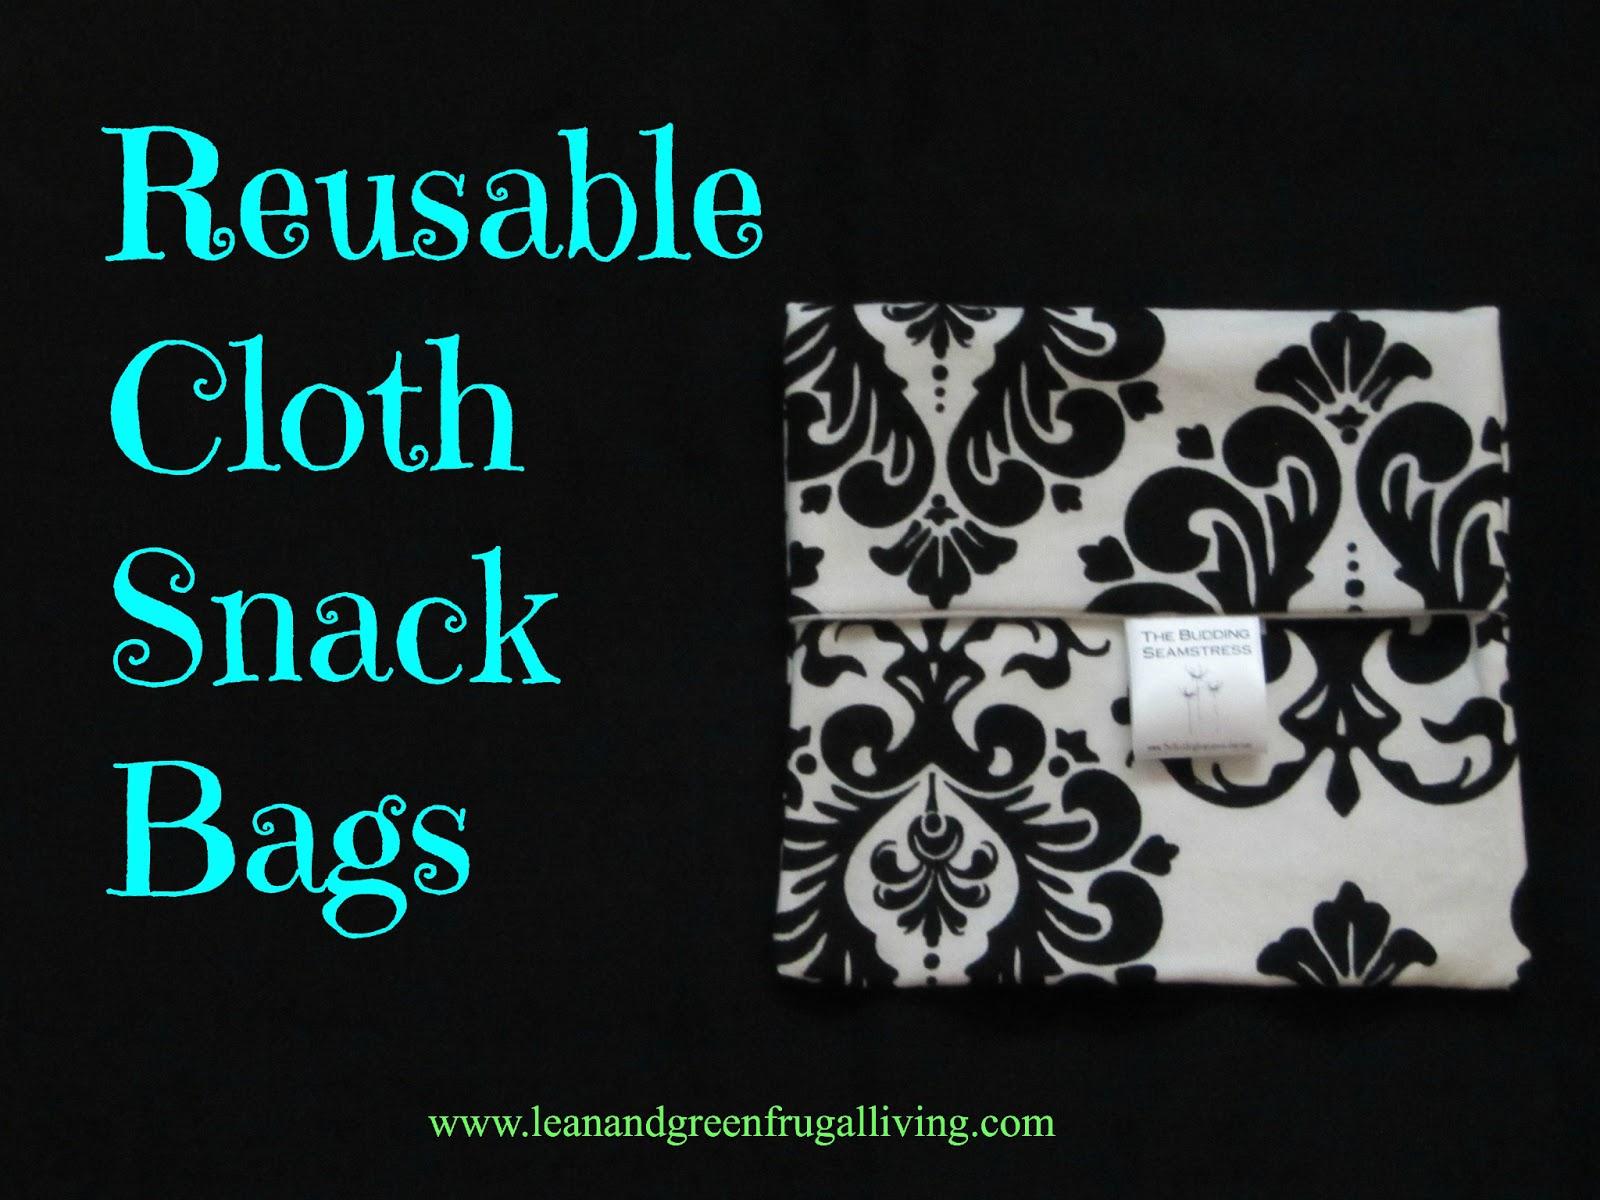 Reusable Cloth Snack Bag Review